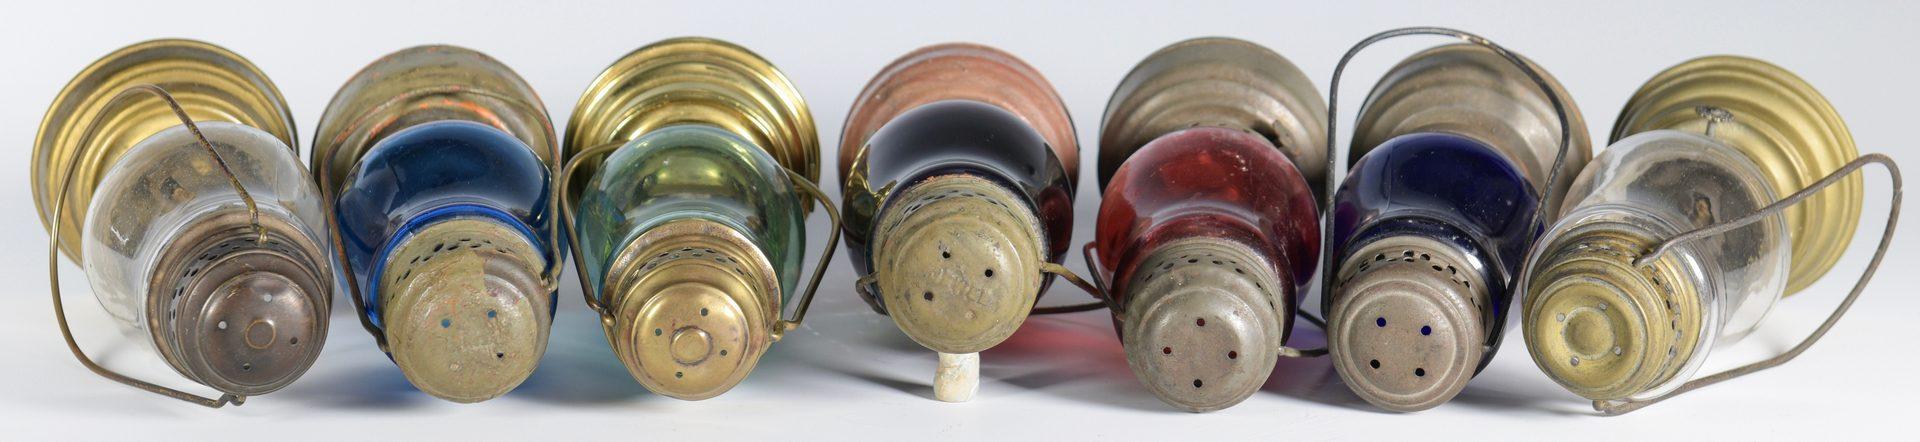 Lot 570: 7 Antique Skater's Lanterns